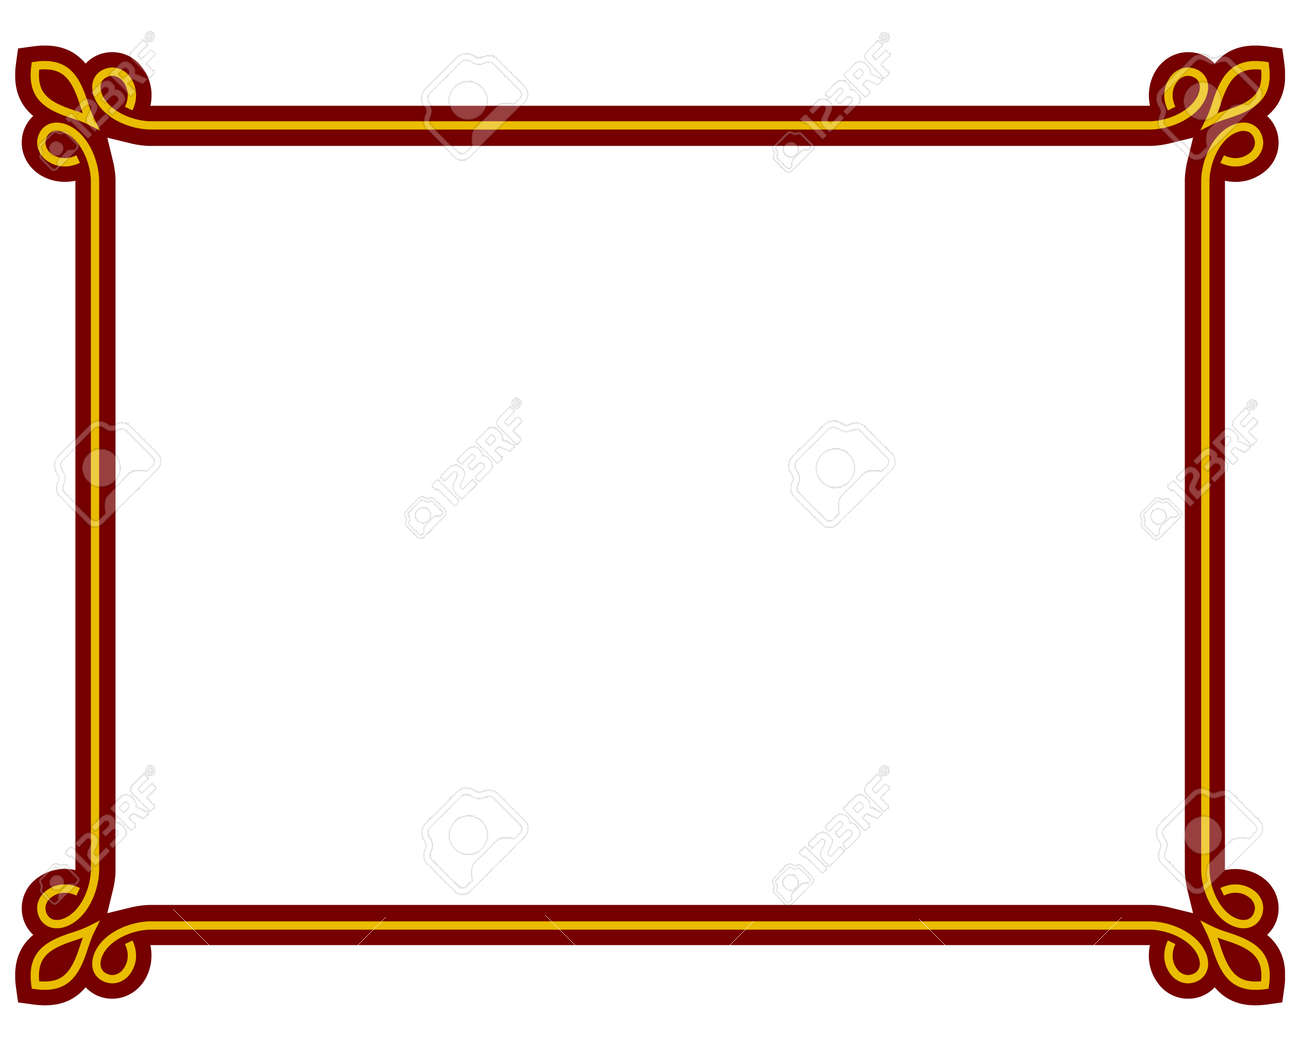 red border frame deco plaque vector art simple line corner royalty